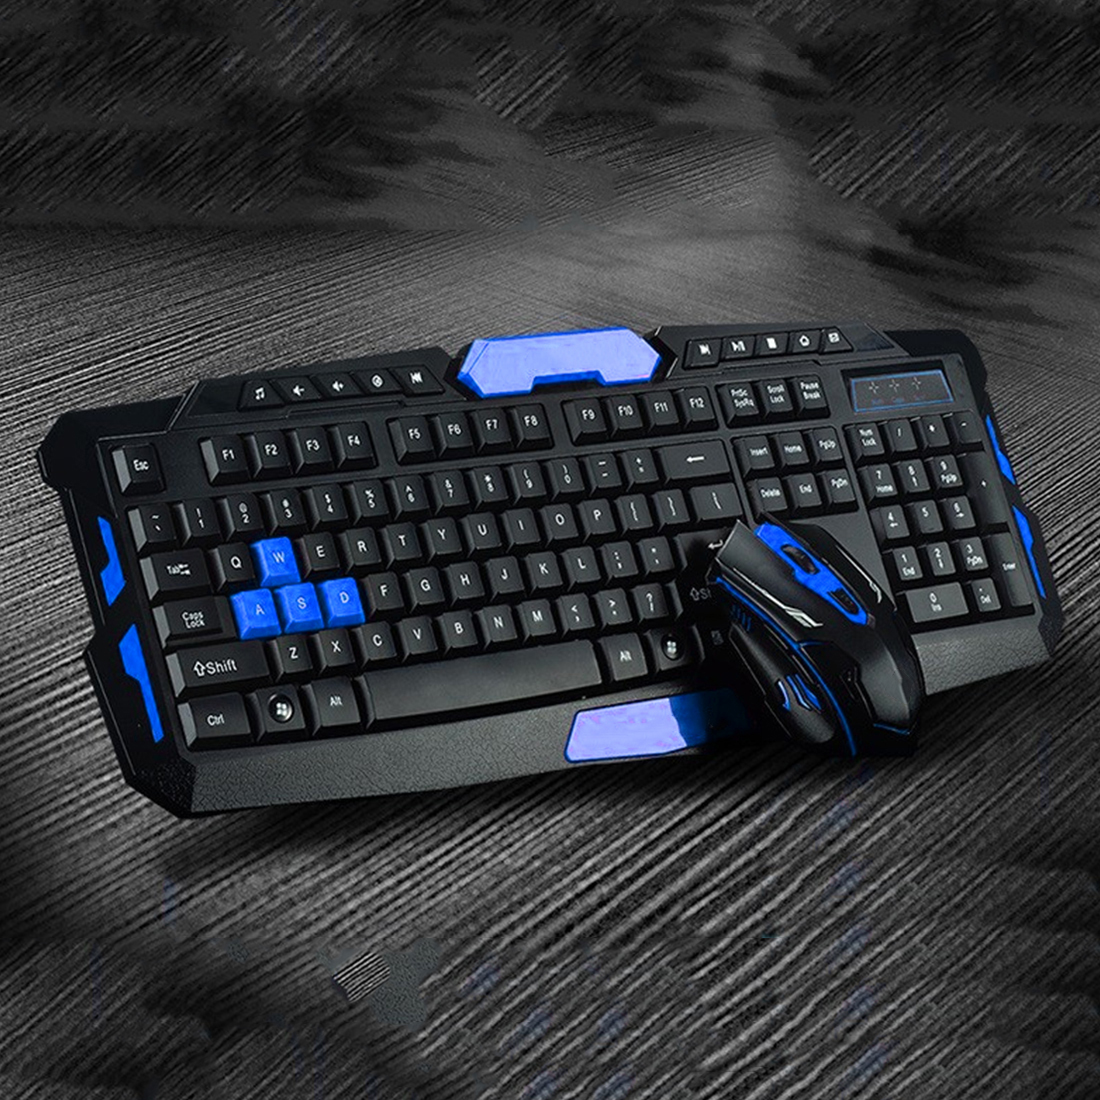 NOYOKERE USB Wireless Keyboard Mouse Set 2.4Ghz 1600DPI Gaming Gamer Mice Multimedia Waterproof for Computer PC desktop